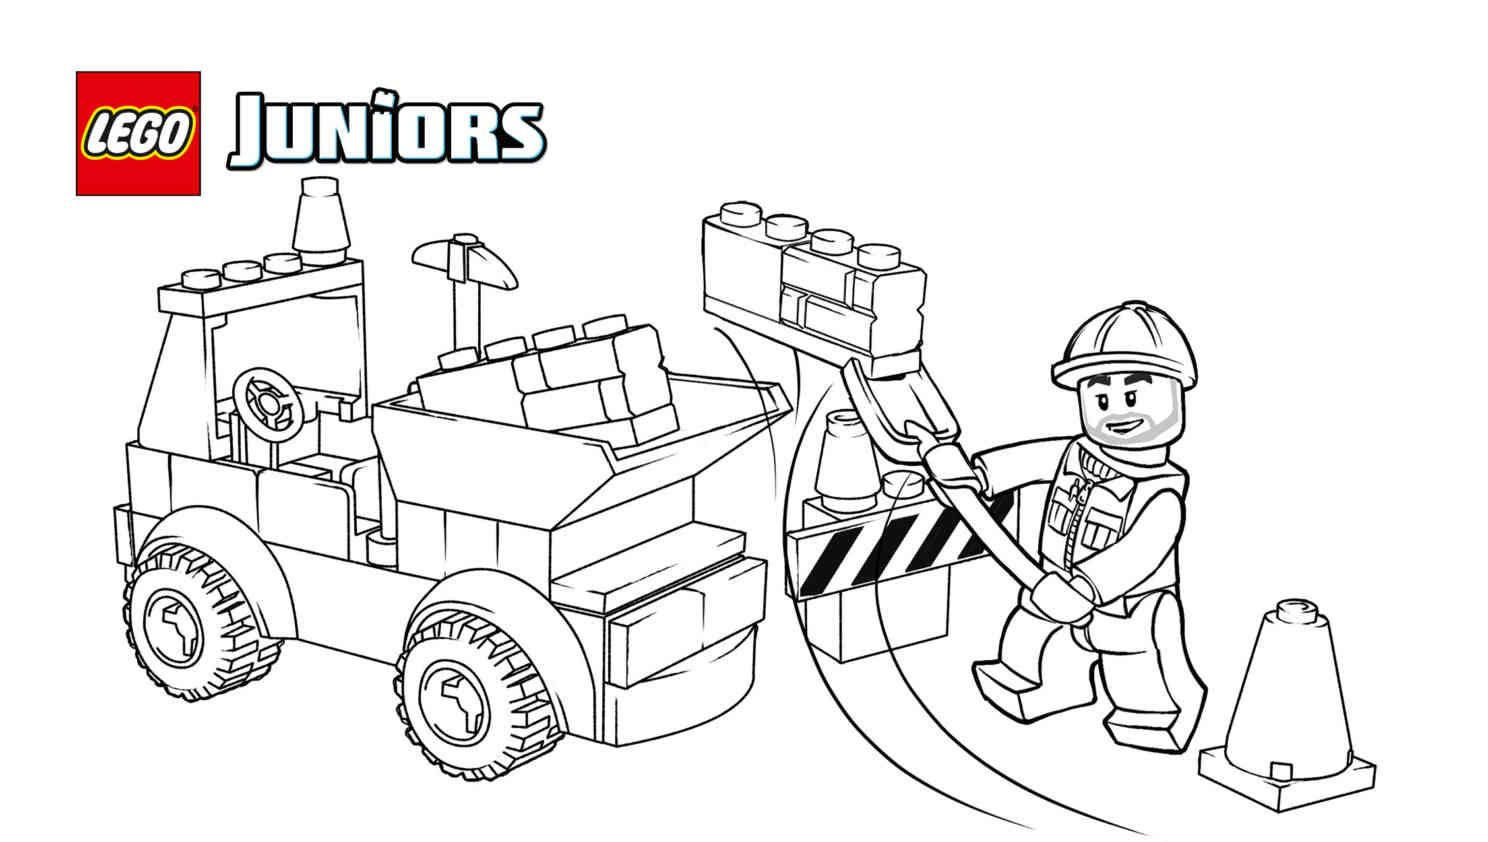 Stop sign coloring page http imagixs com stop sign coloring pages - Lego Juniors Coloring Pages Http Www Lego Com En